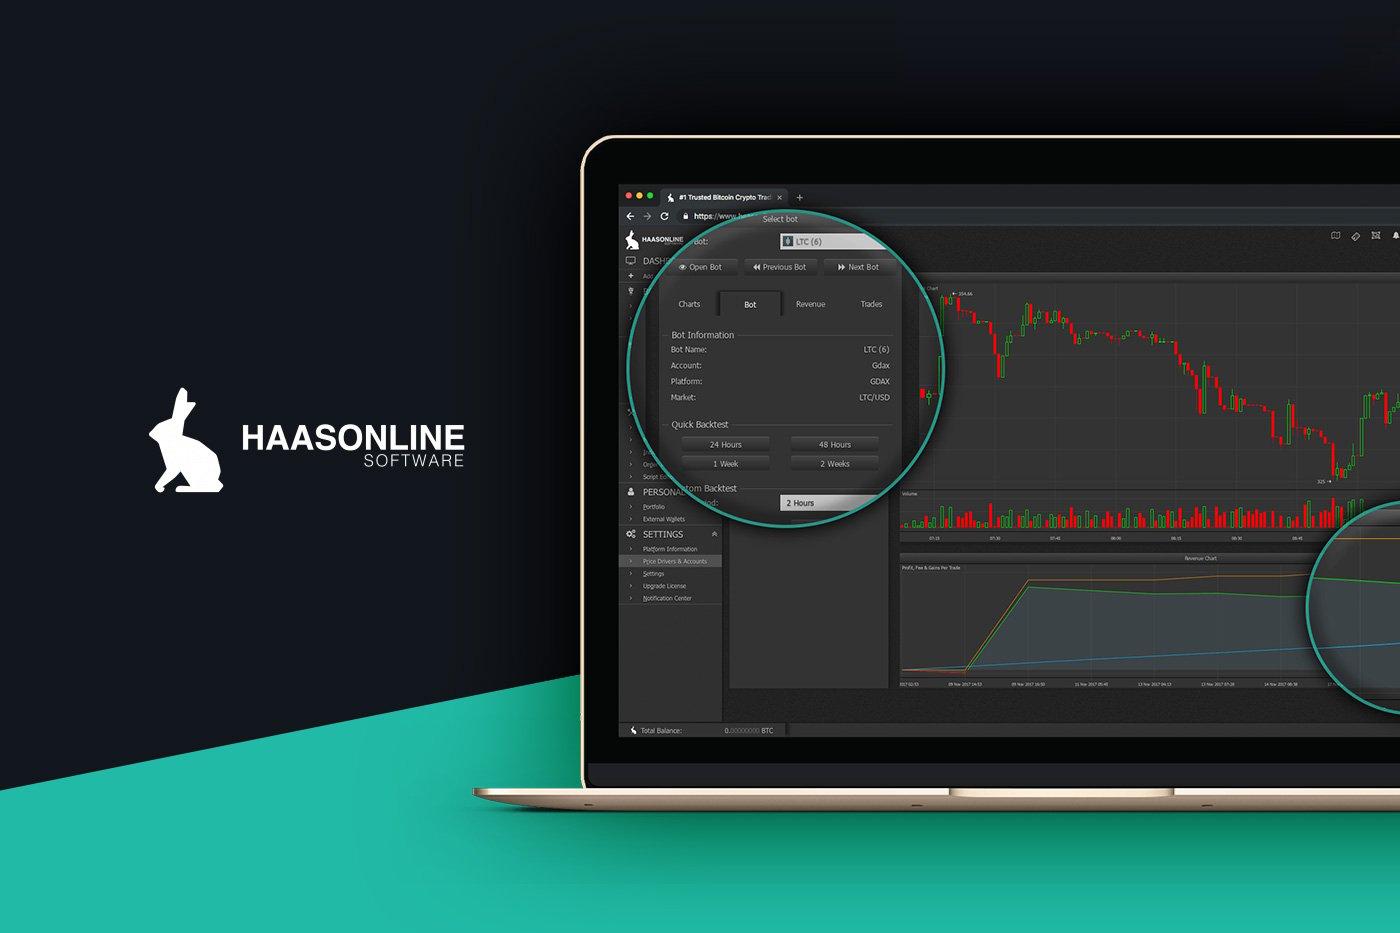 haasonline software)